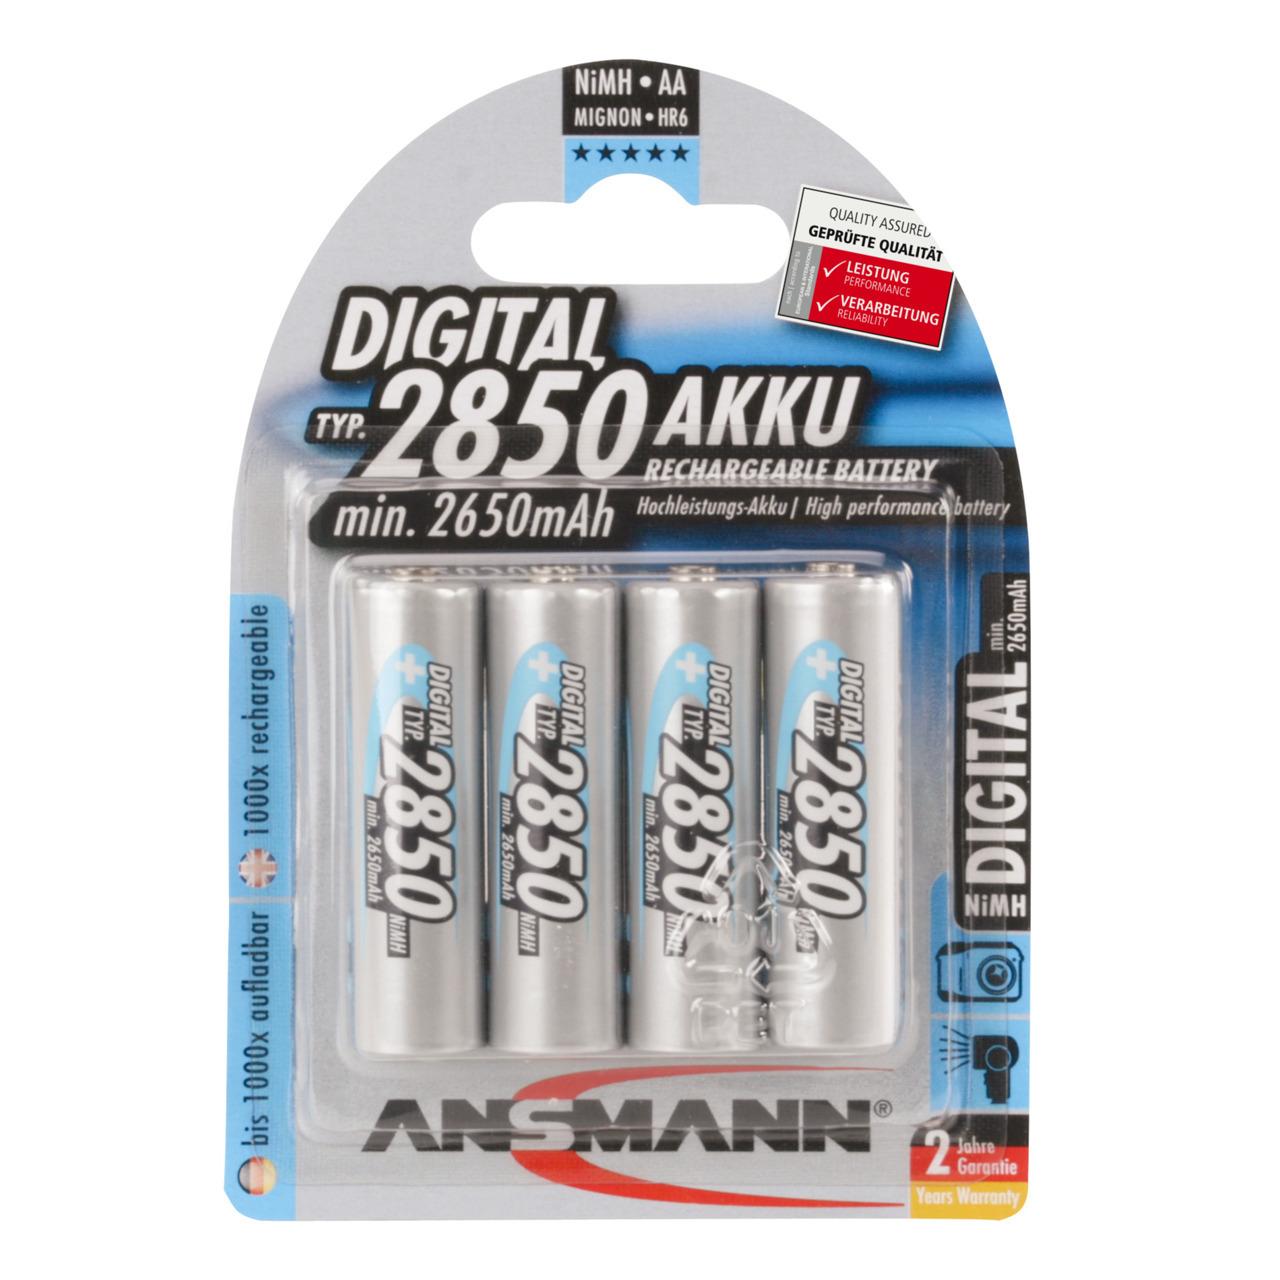 Ansmann DIGITAL NiMH Akku- Mignon AA- Typ 2850- R6 4er Pack